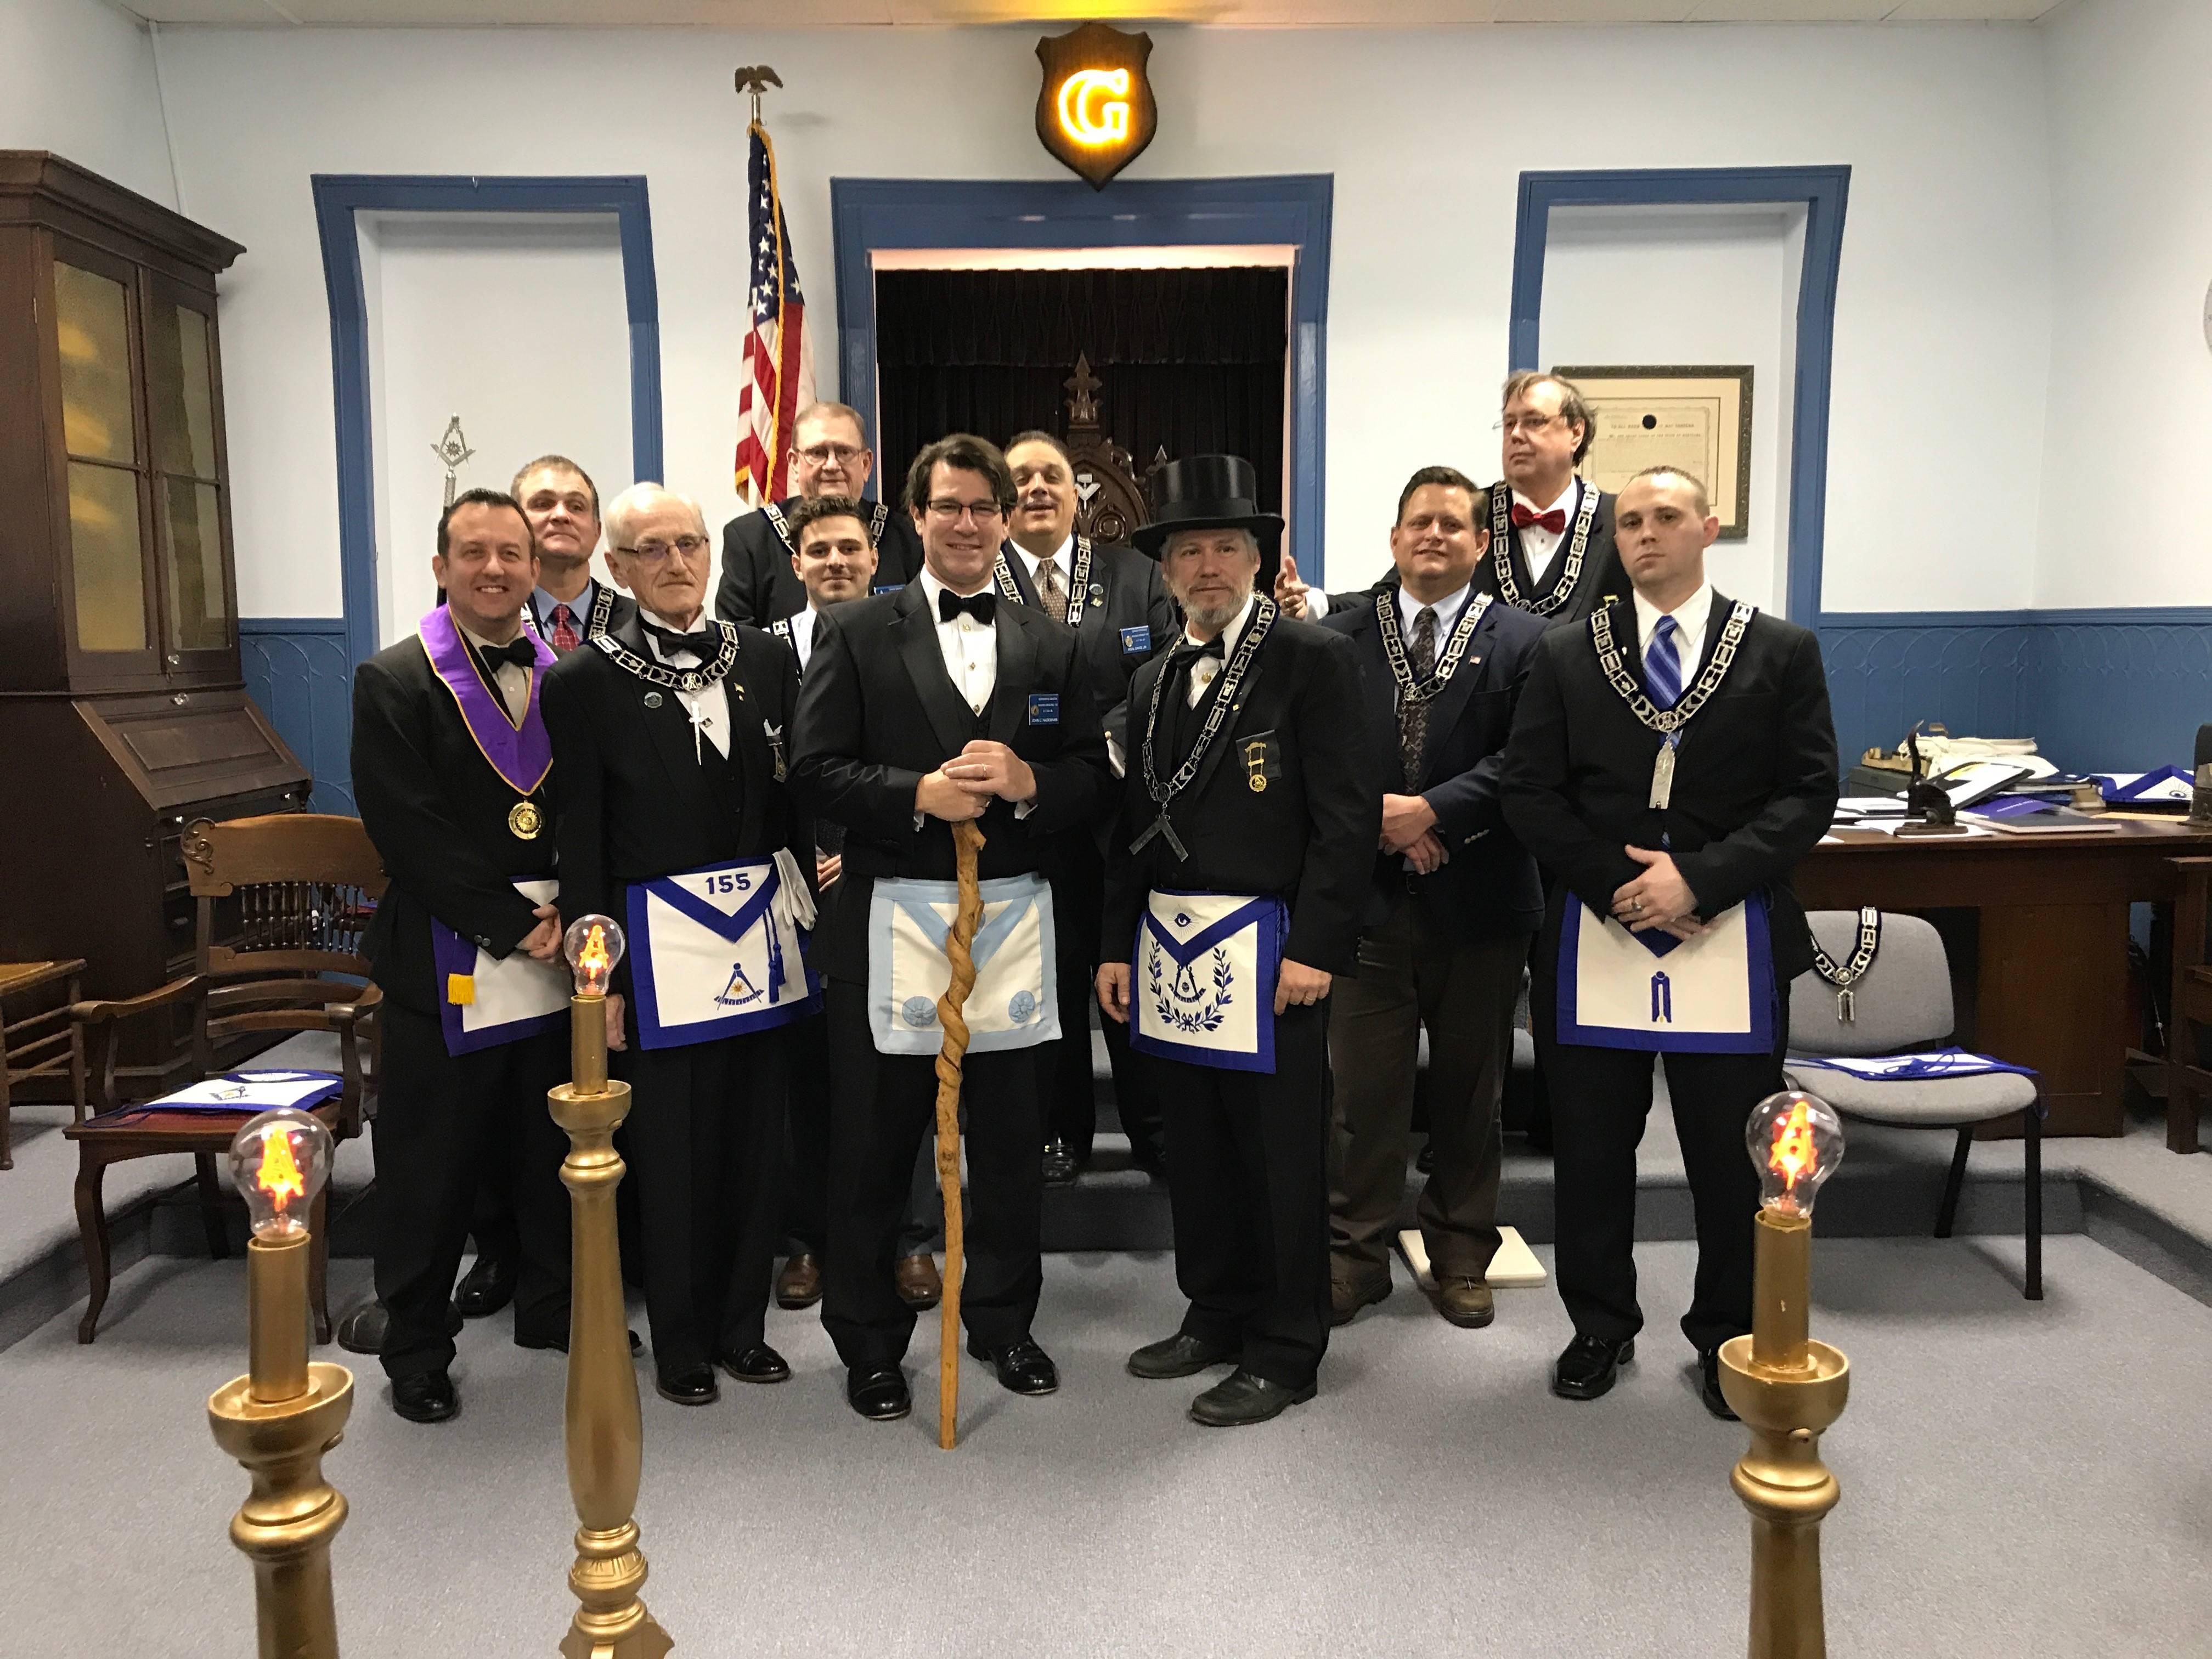 2019 Acacia Lodge Officers